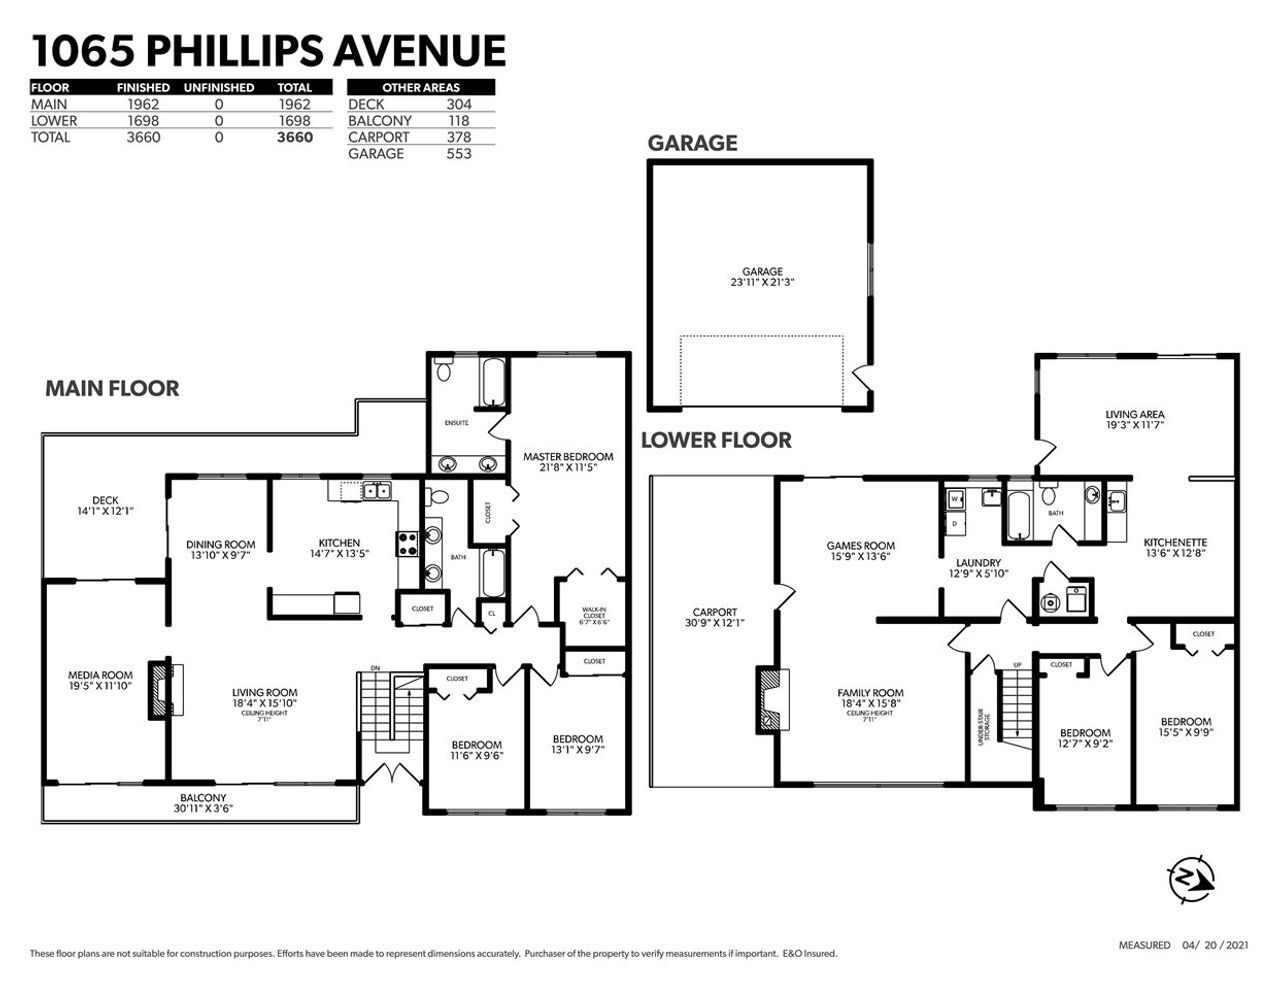 1065-phillips-avenue-simon-fraser-univer-burnaby-north-14 at 1065 Phillips Avenue, Simon Fraser Univer., Burnaby North